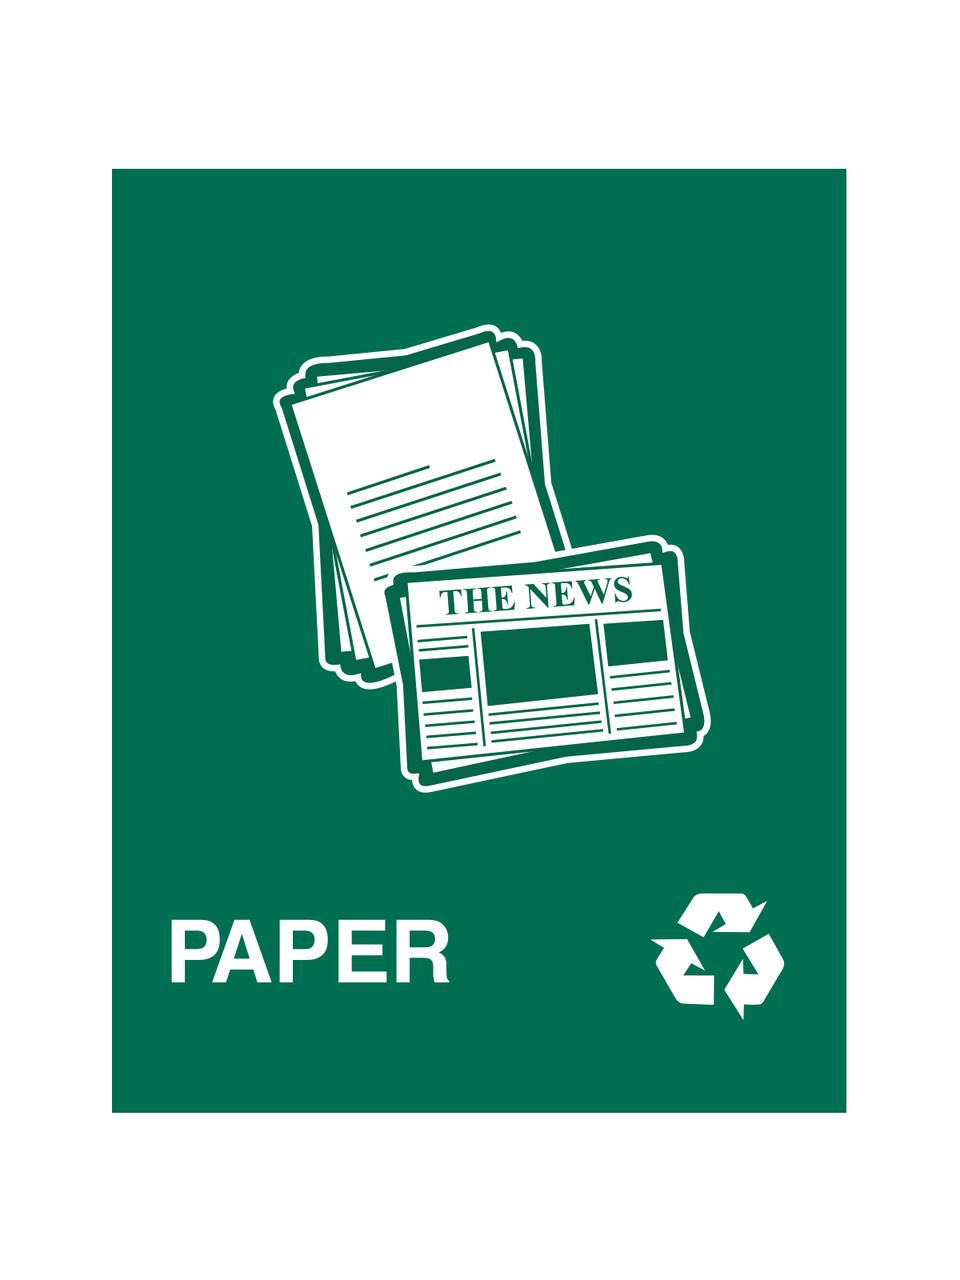 PAPER (GREEN)